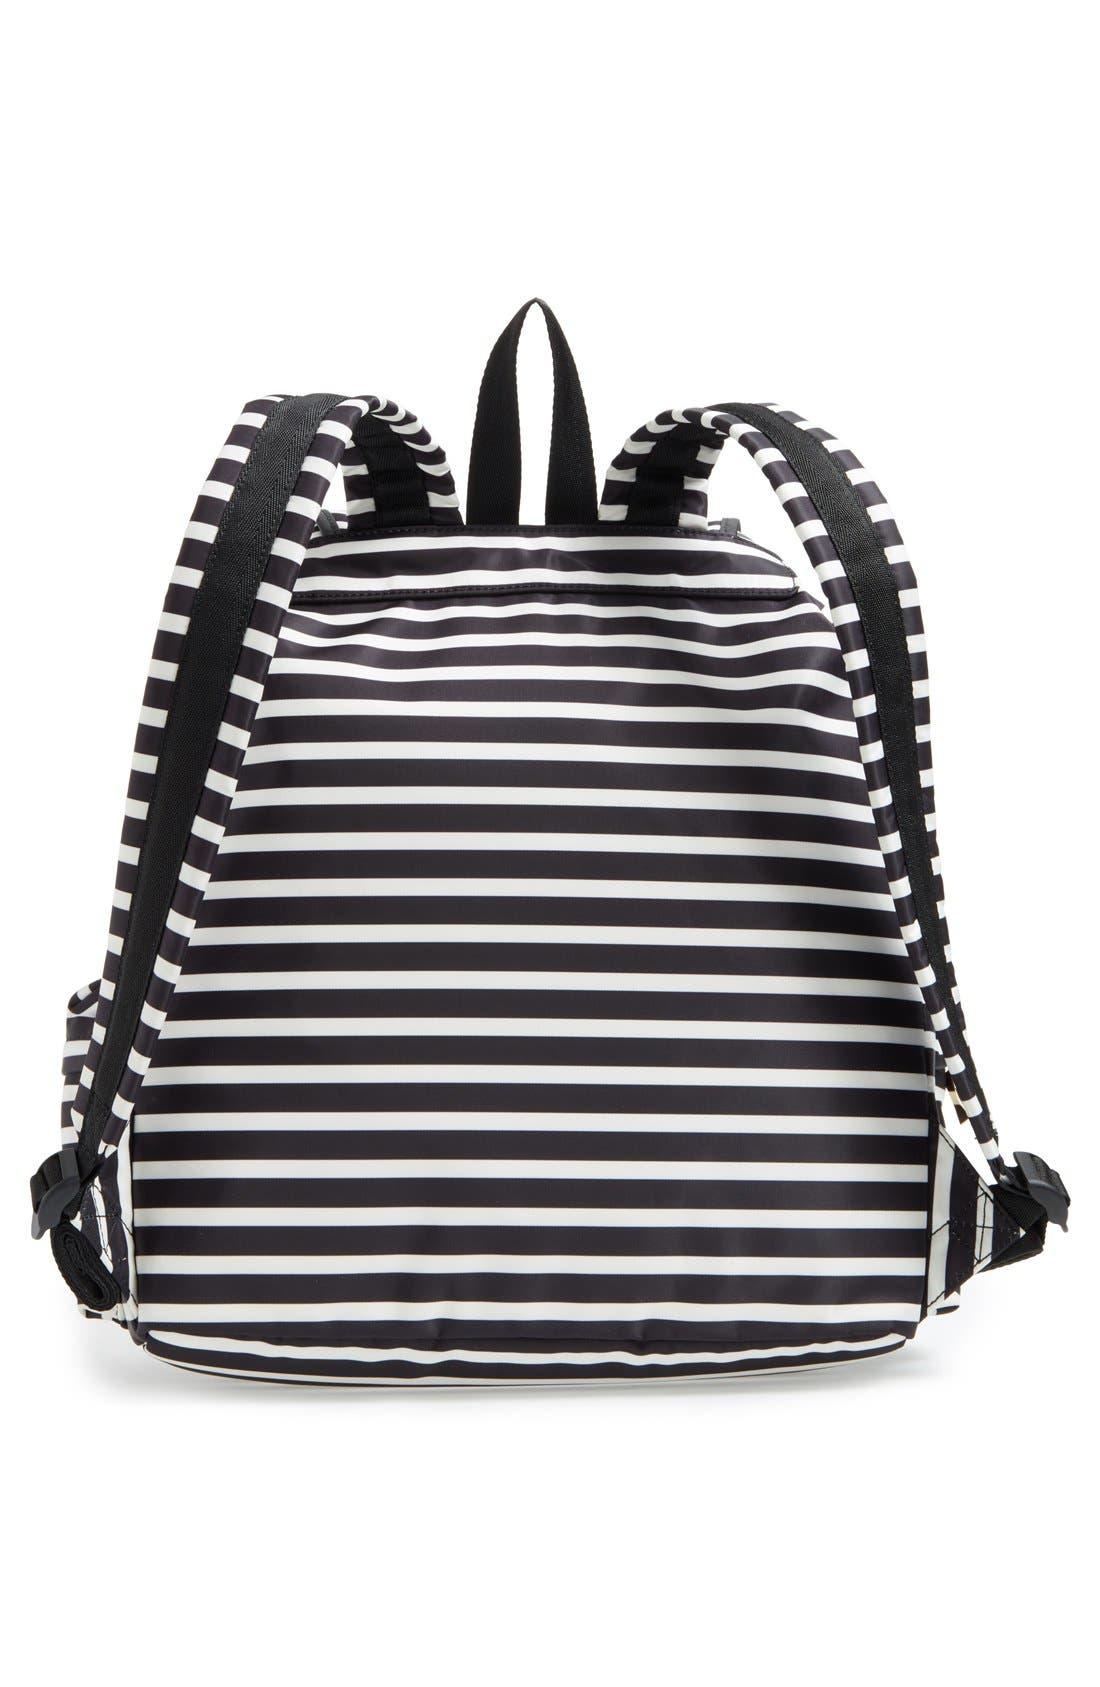 Alternate Image 3  - kate spade new york 'classic - clay' nylon backpack